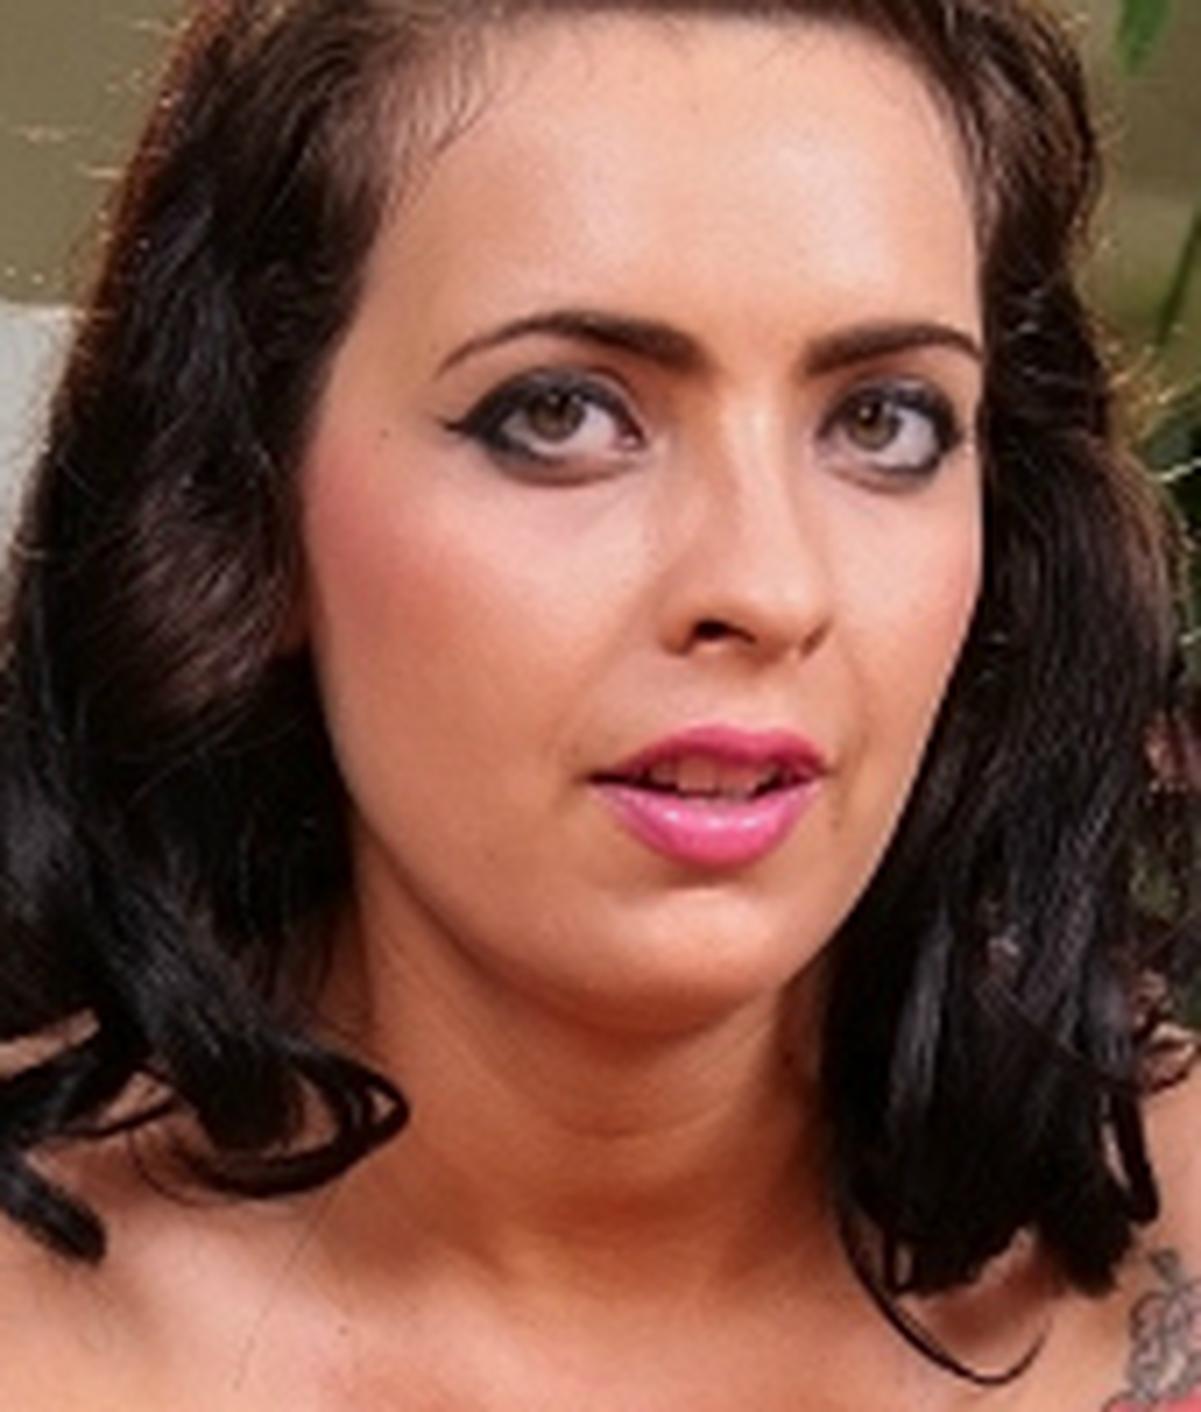 Fernanda Magalhoes